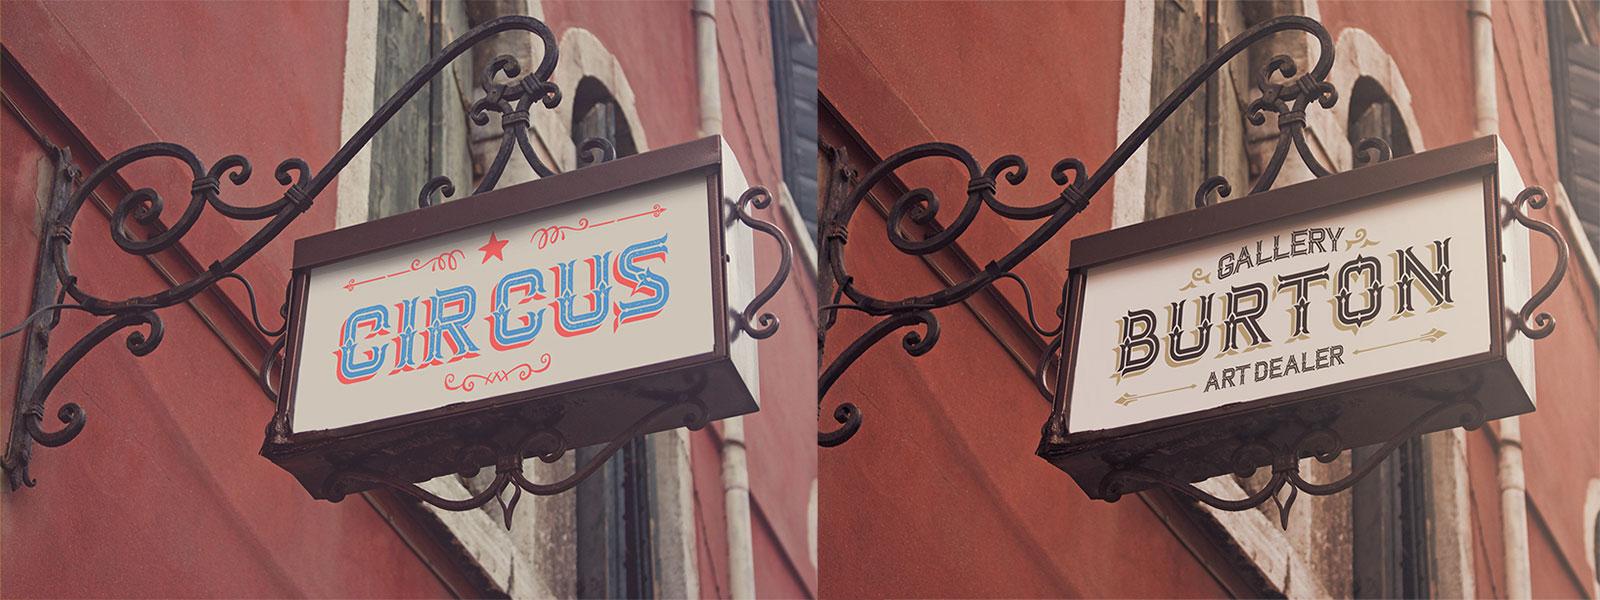 Free-Vintage-Wall-Sign-Board-Mockup-PSD